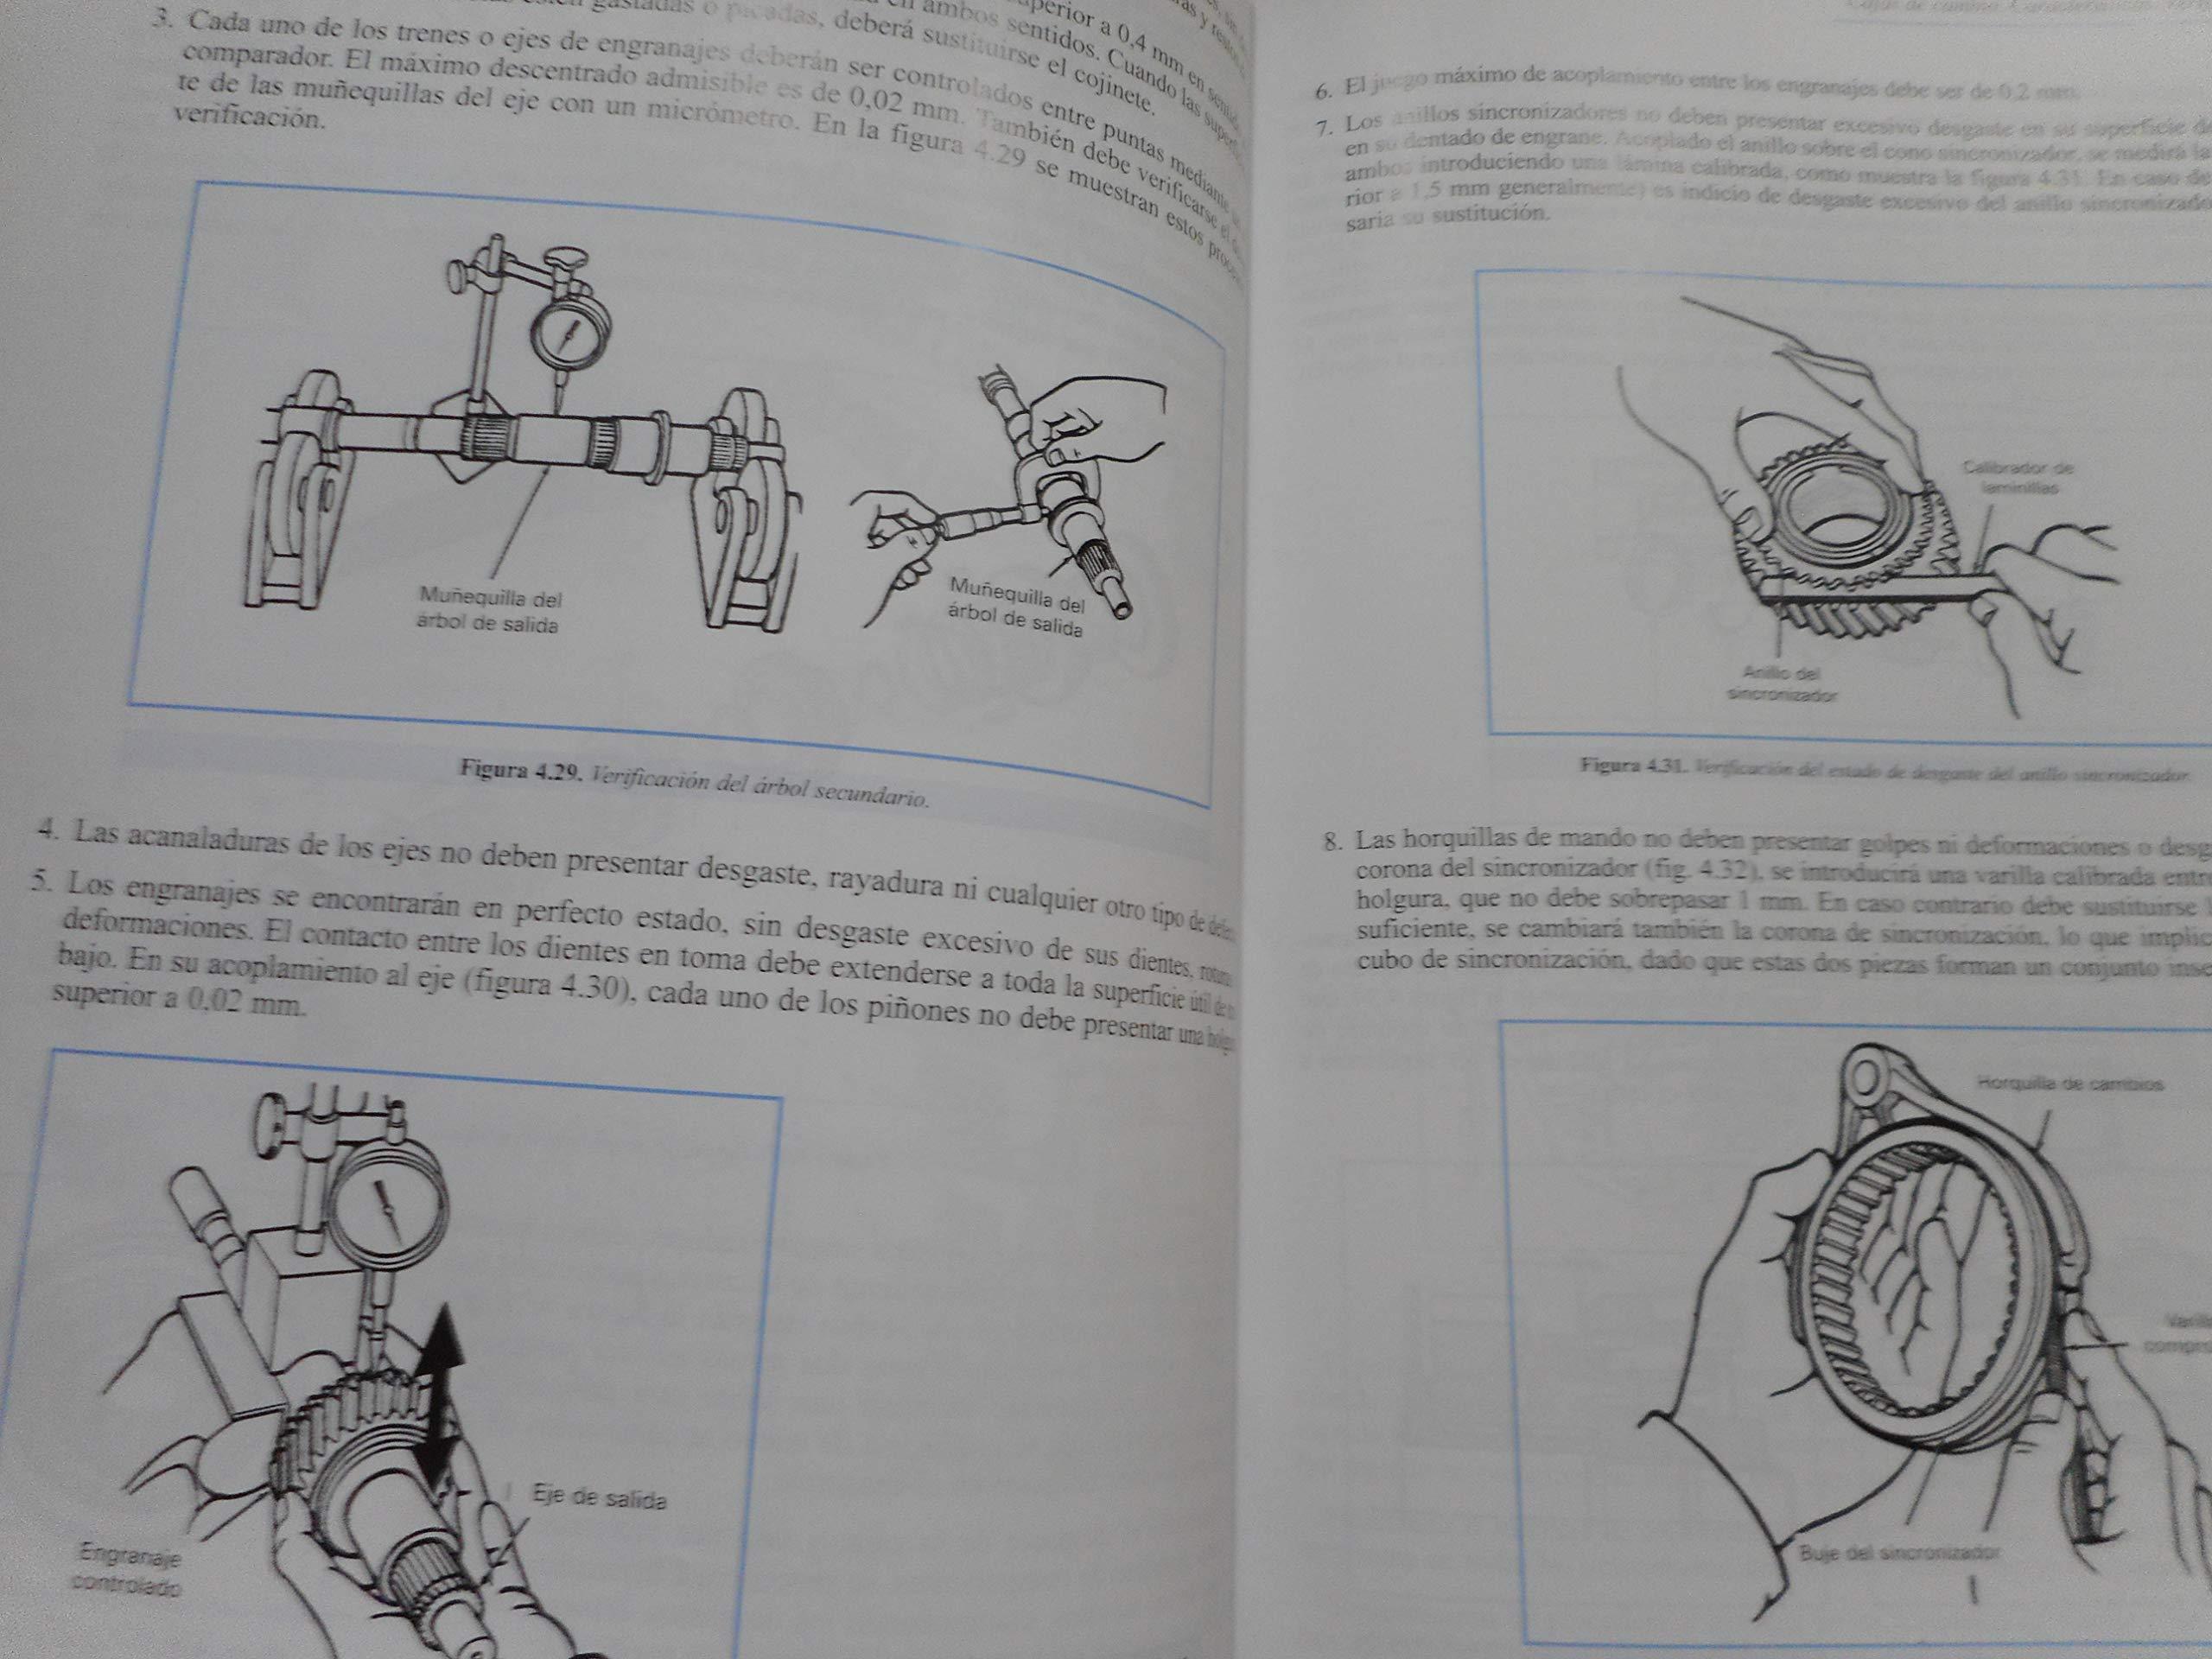 Sistemas de Transmision y Frenado (Spanish Edition): Jose Manuel Alonso Perez: 9788497320344: Amazon.com: Books